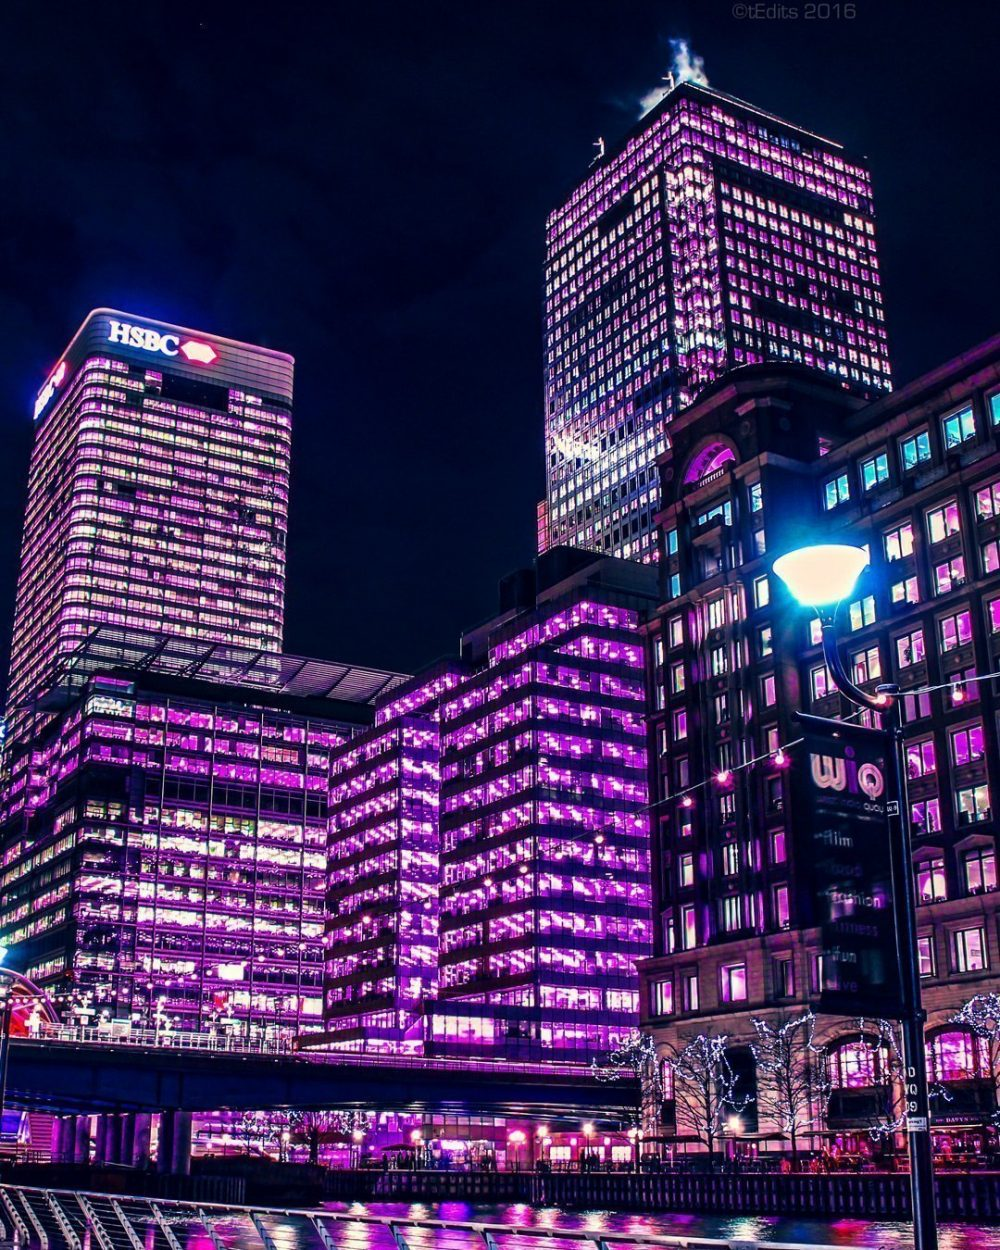 West India Quay, Canary Wharf Neon Purple